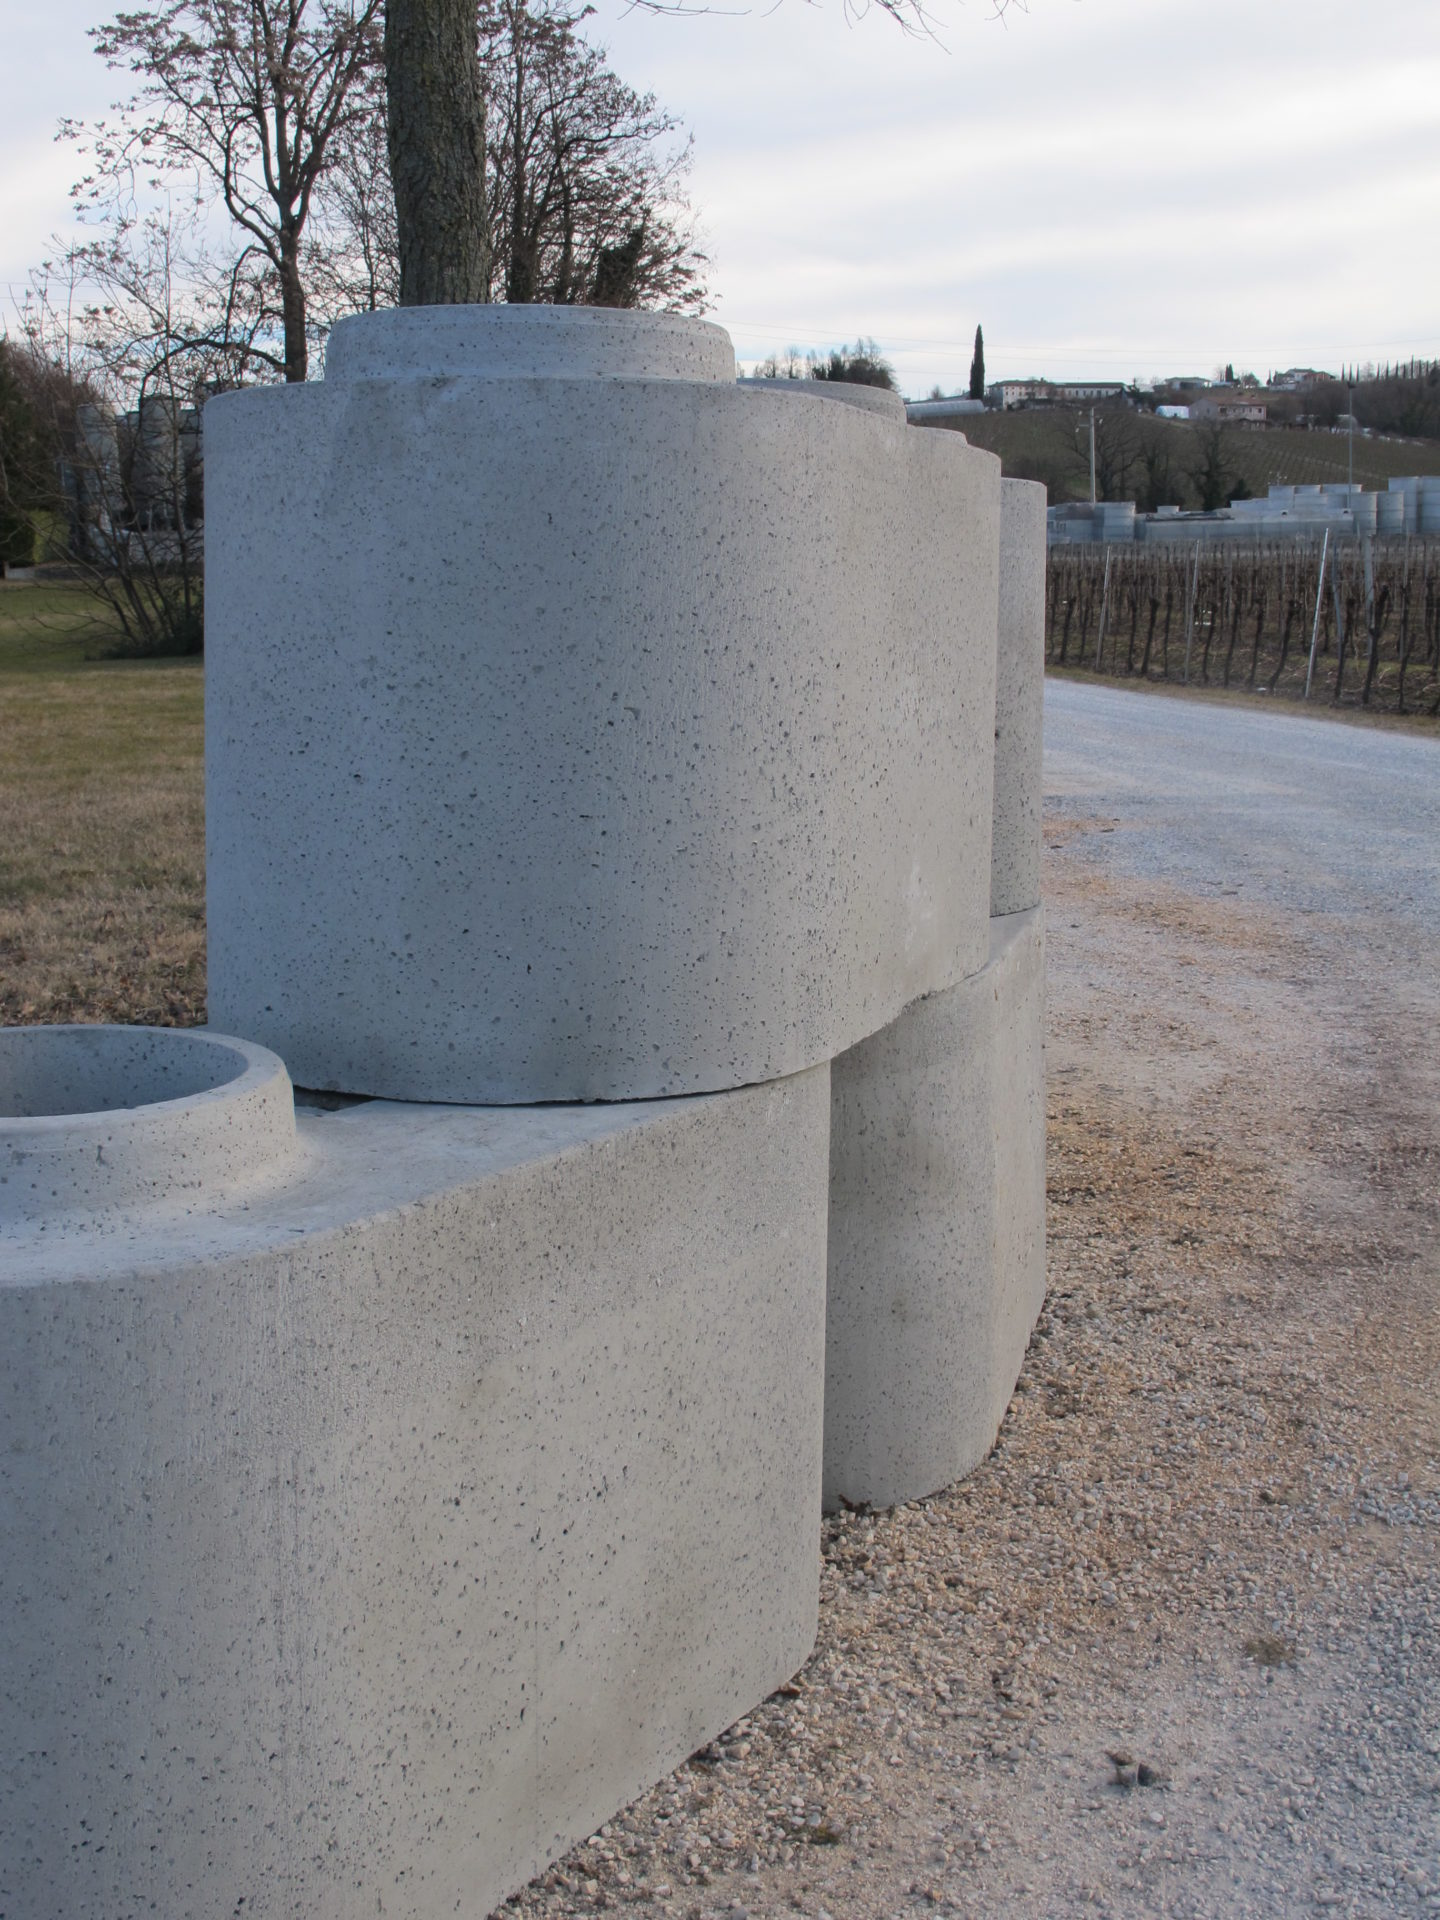 IMG 6728 - Muri divisori EURO-LEGO Light - strade-